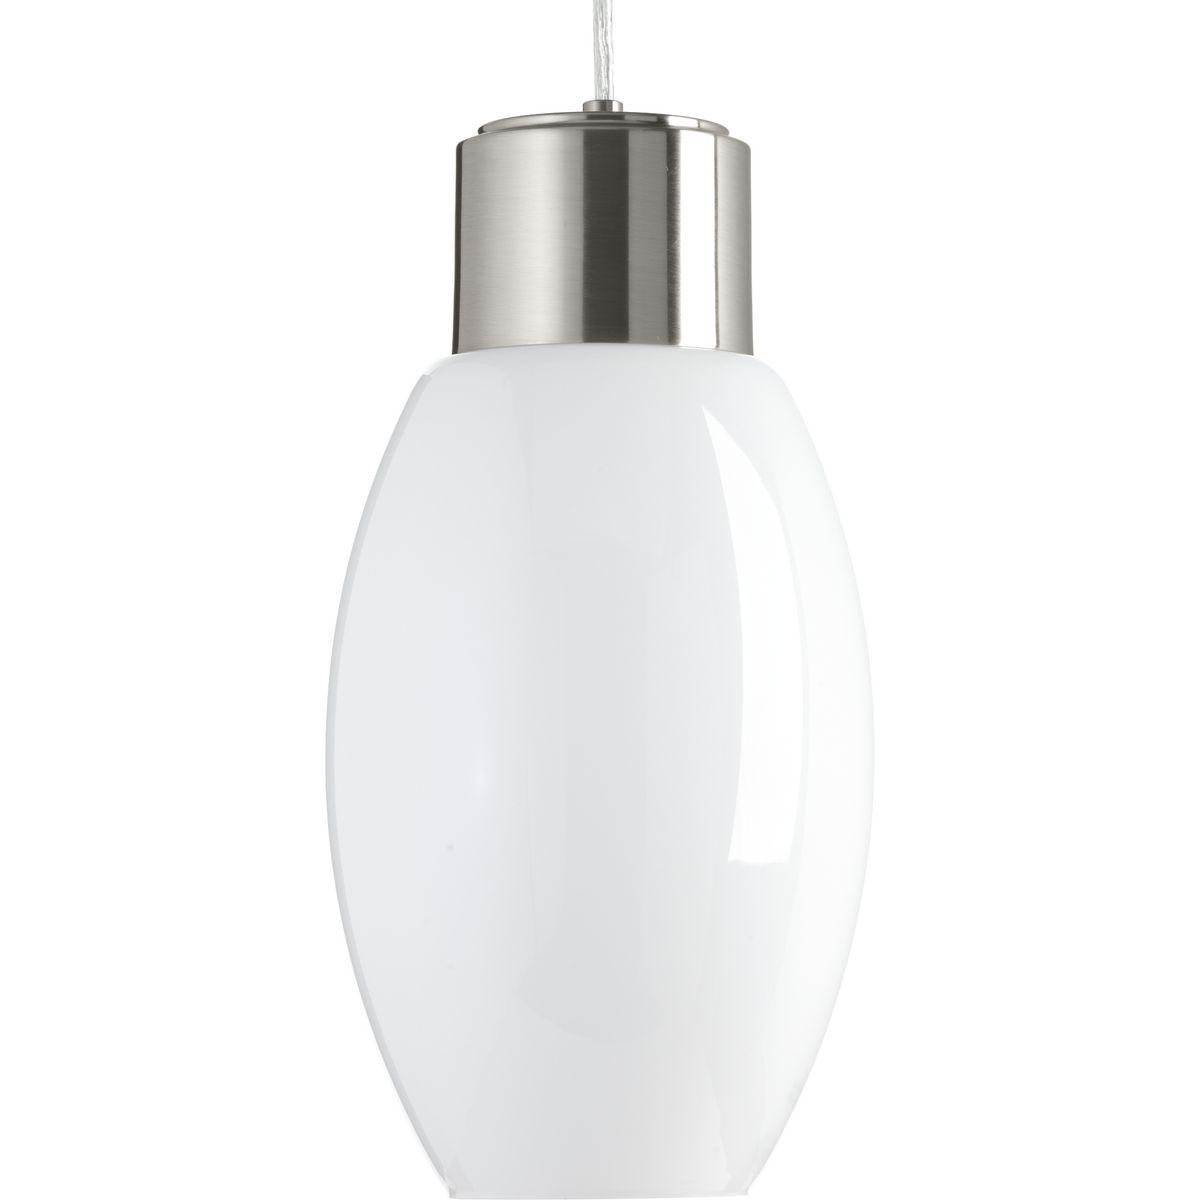 P500066-009-30 PROGRESS NEAT LED ONE-LIGHT PENDANT NICKEL